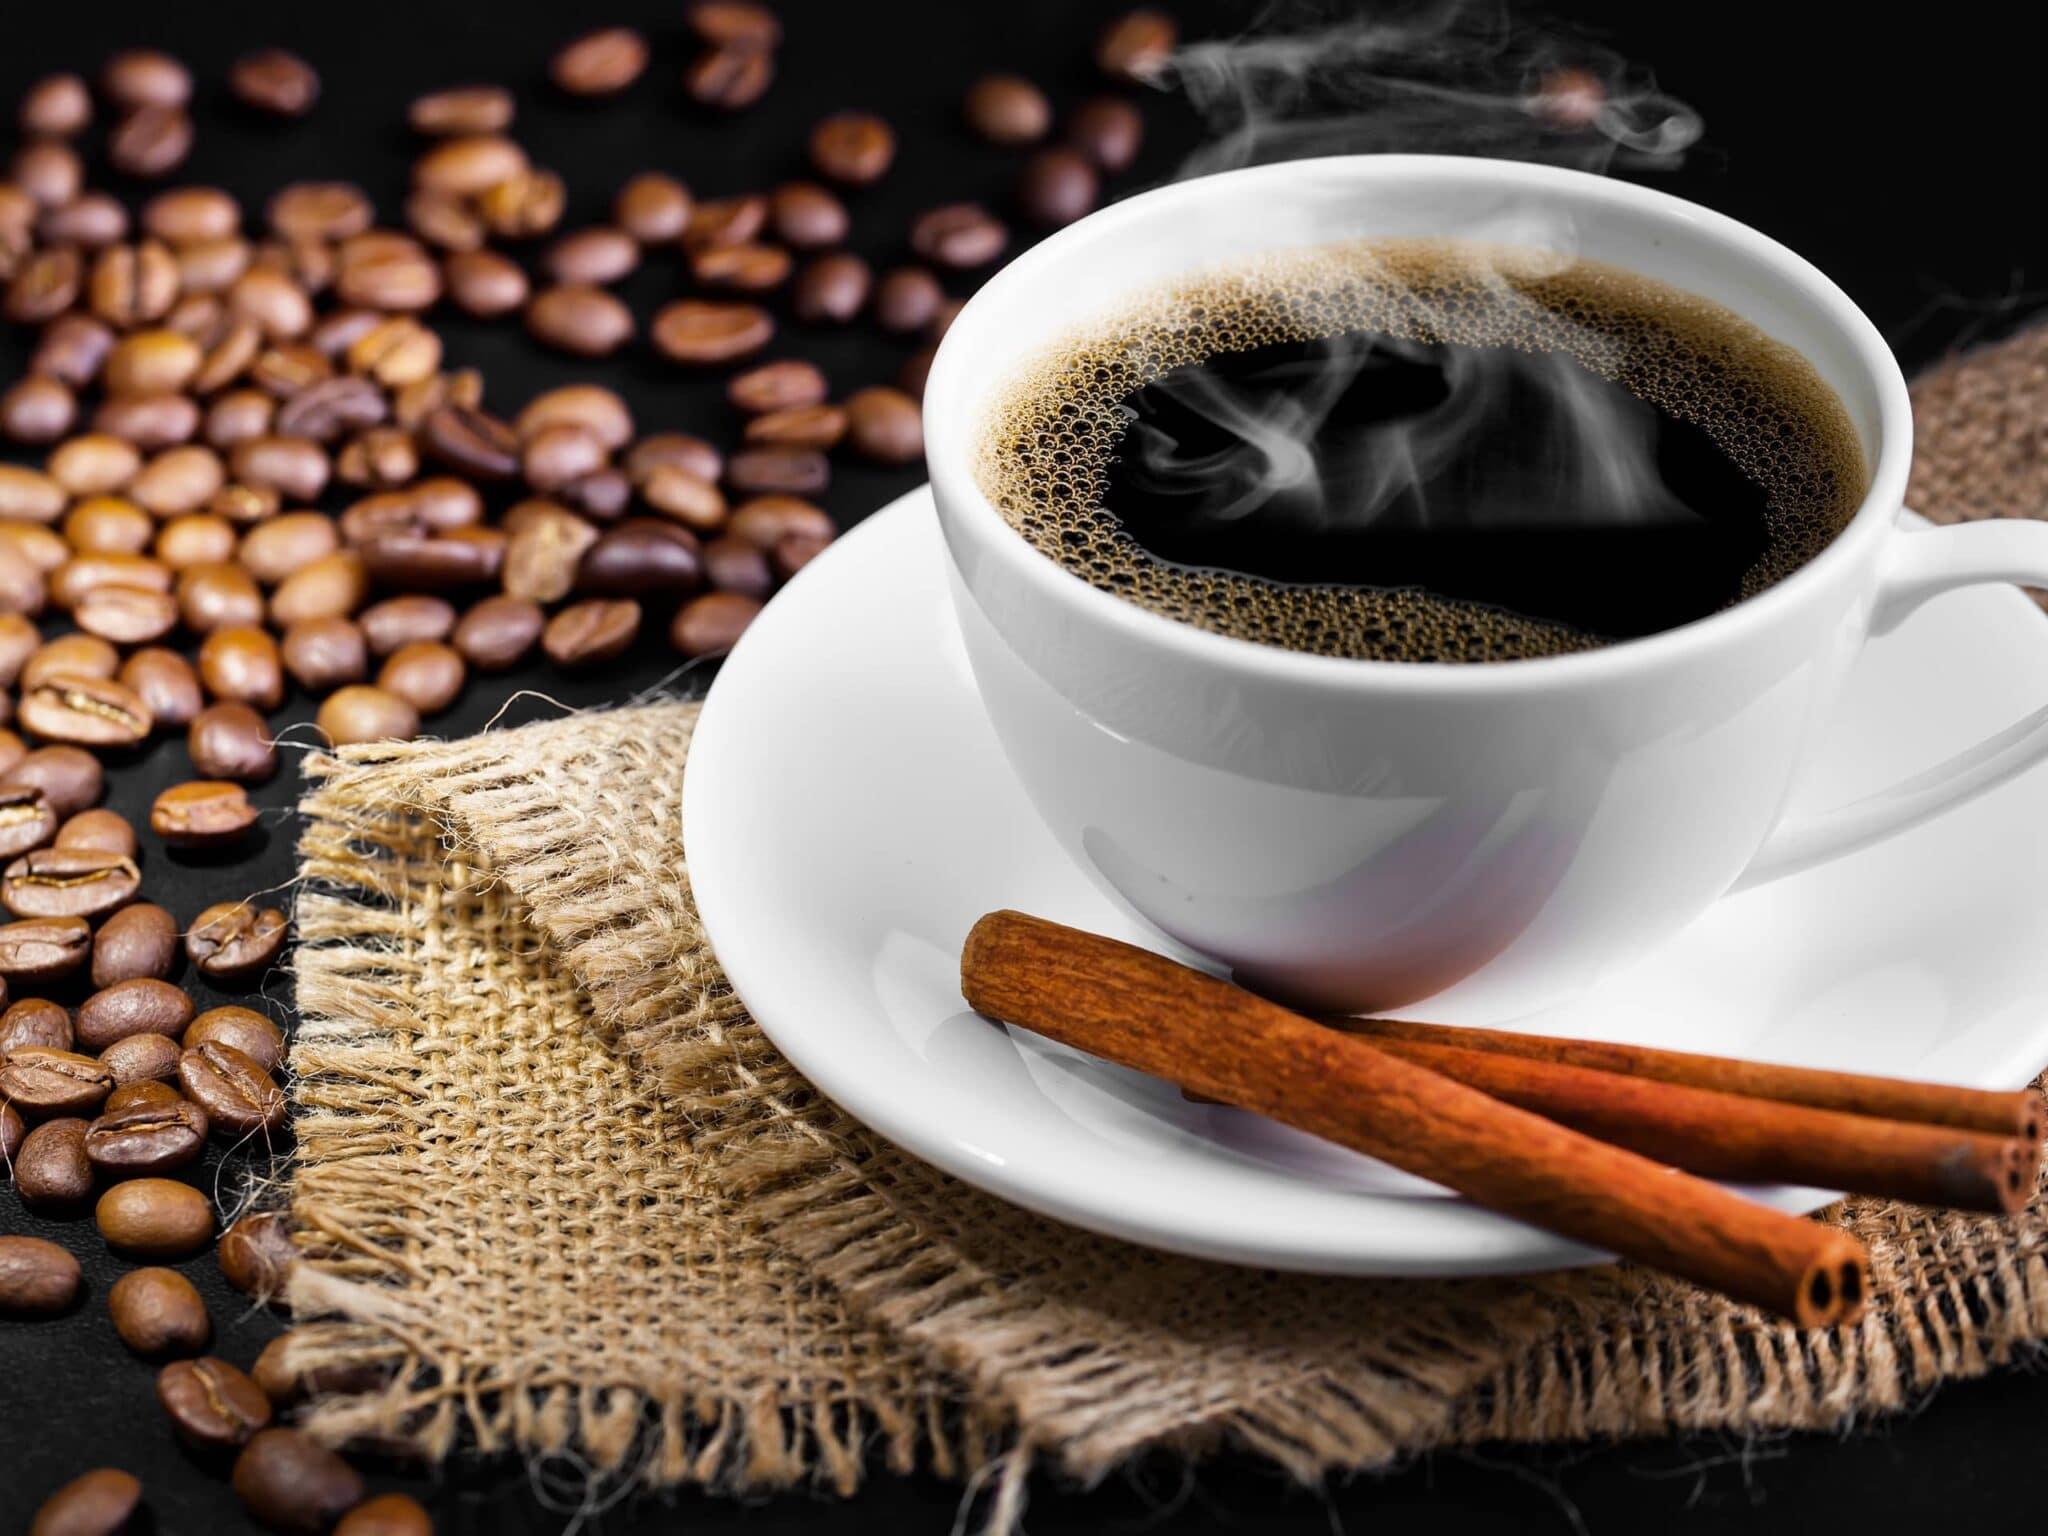 consumul de cafea recomandat in dieta zilnica